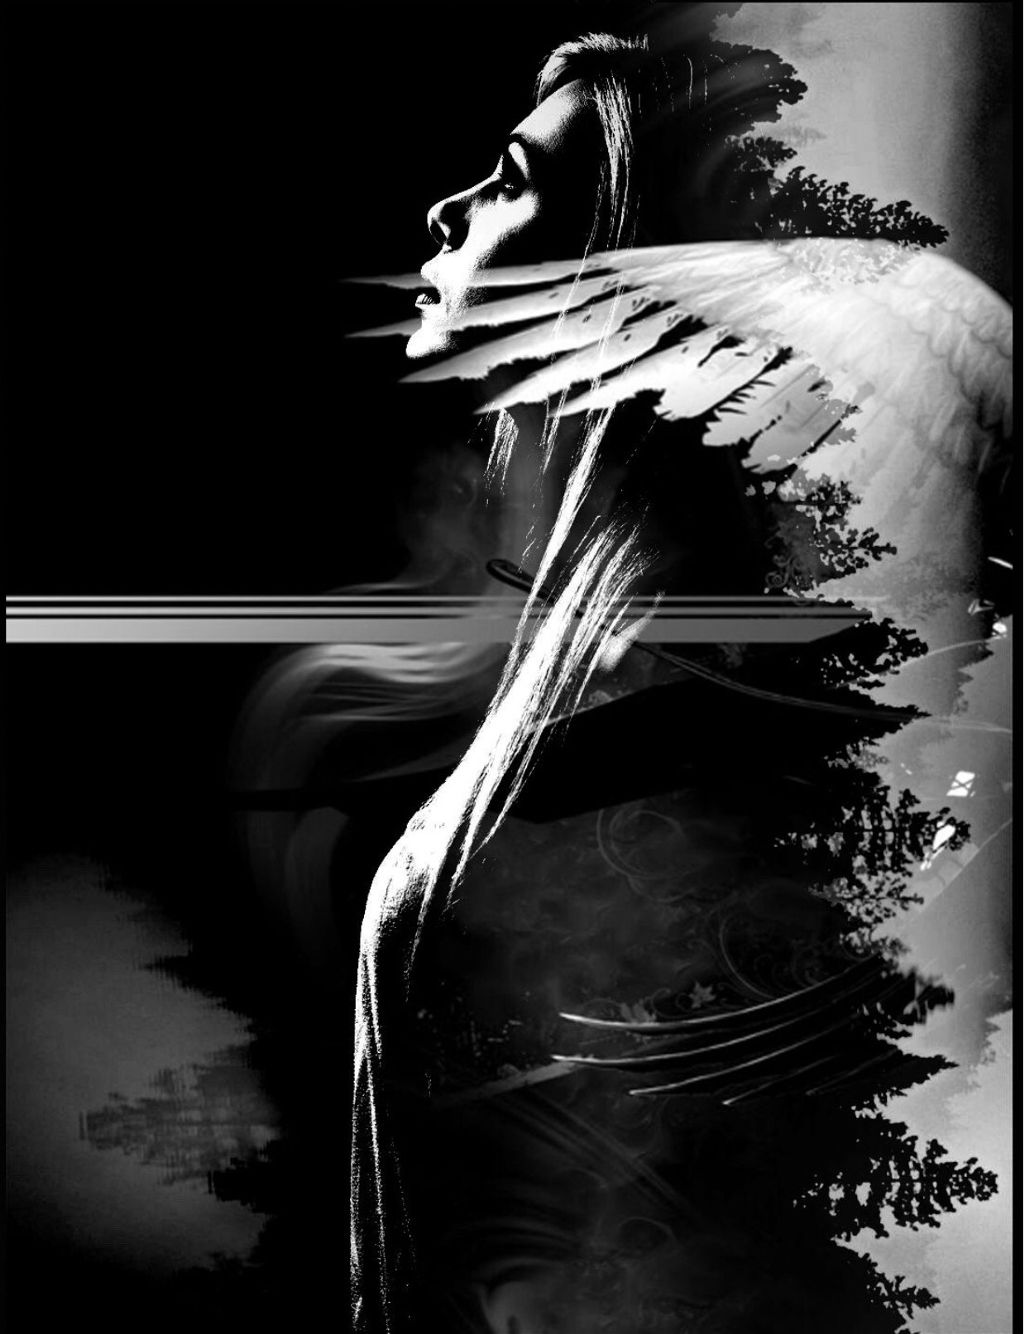 #freetoedit she talks to angels #myedit #doubleexposure #darkart_saturday